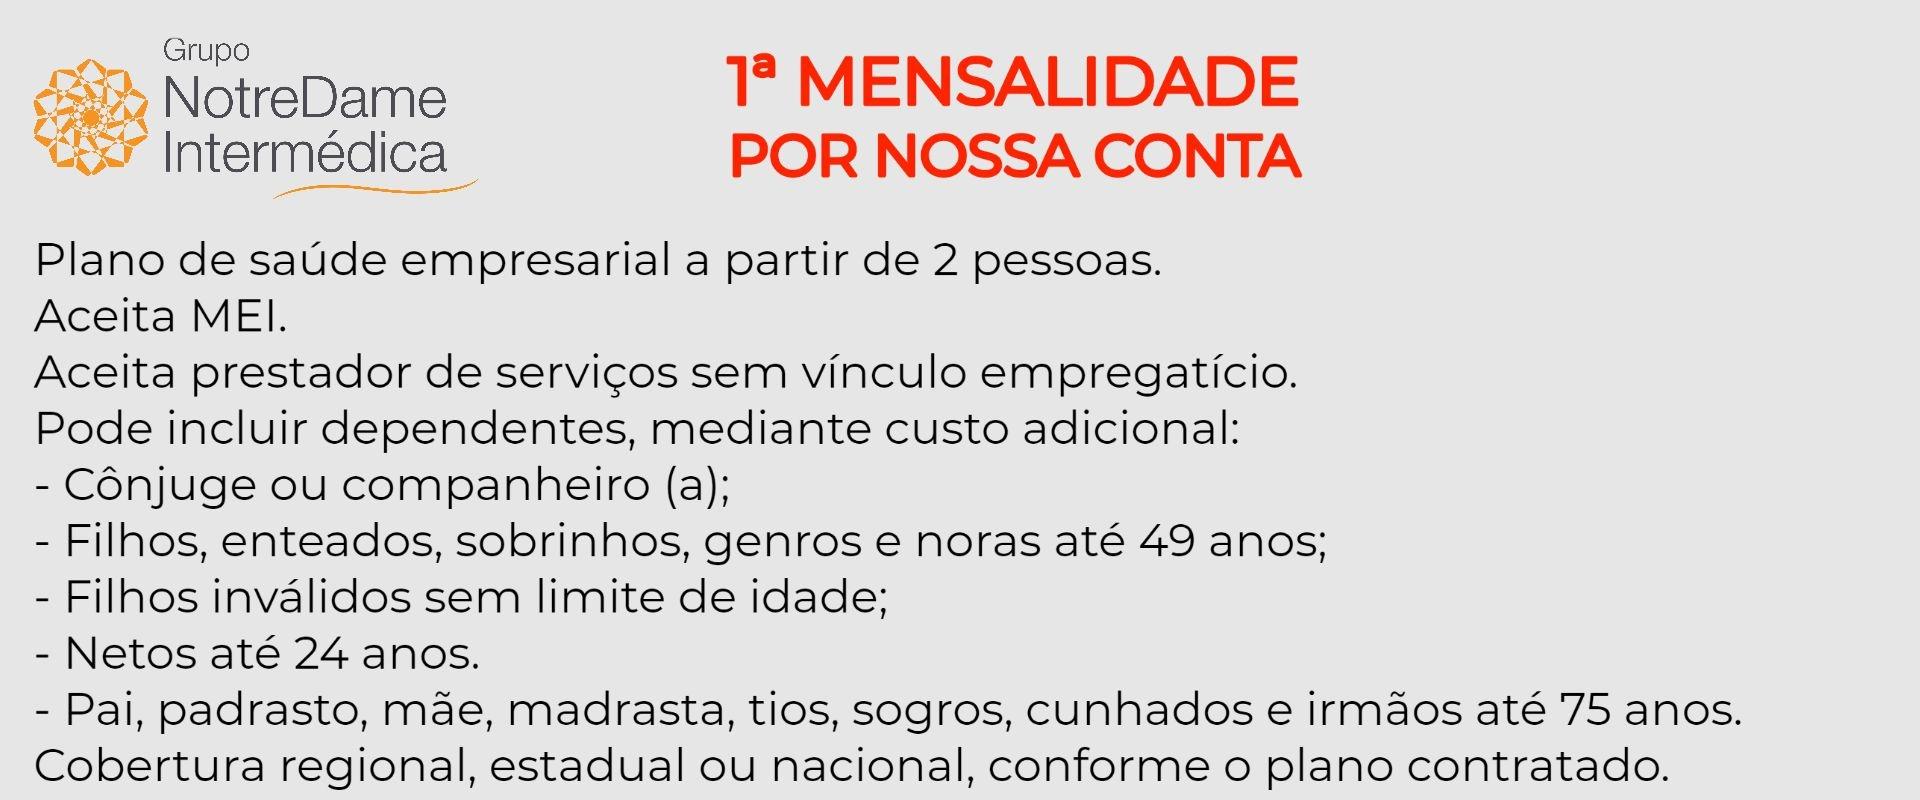 GNDI - Grupo Notredame Intermédica Empresarial - Ferraz de Vasconcelos